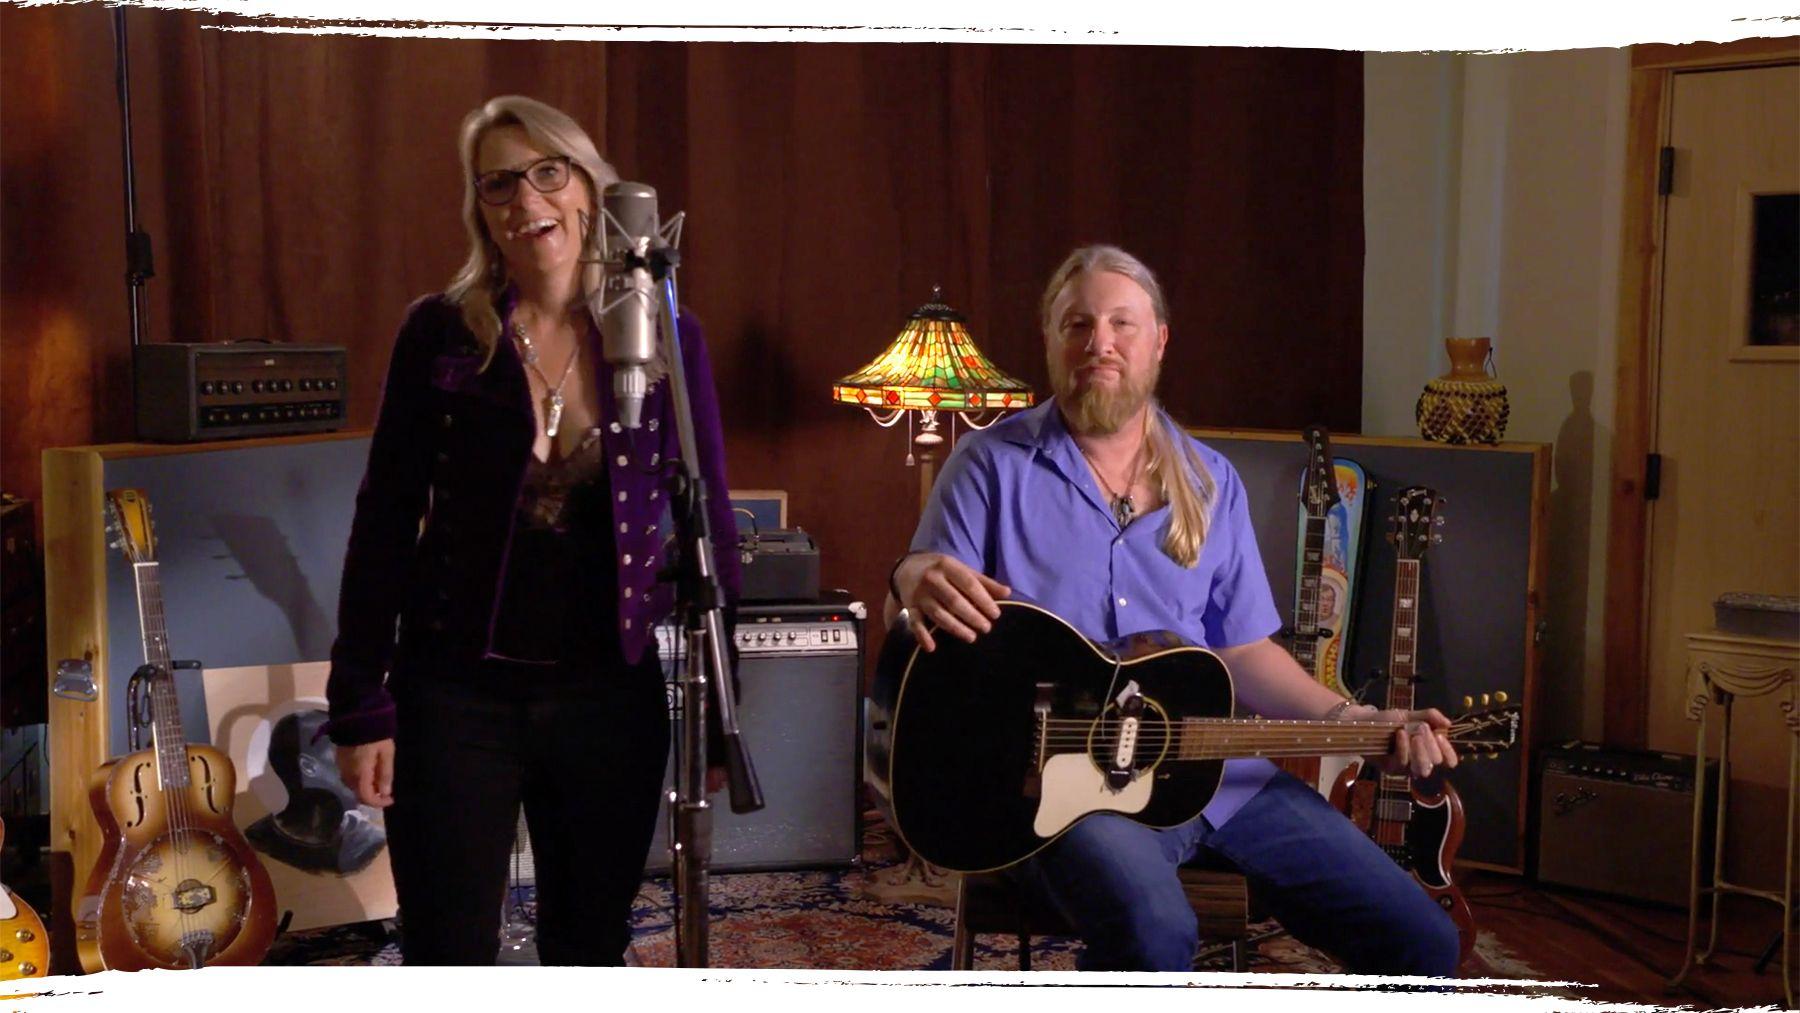 Derek and Susan: Guitar Legends 4